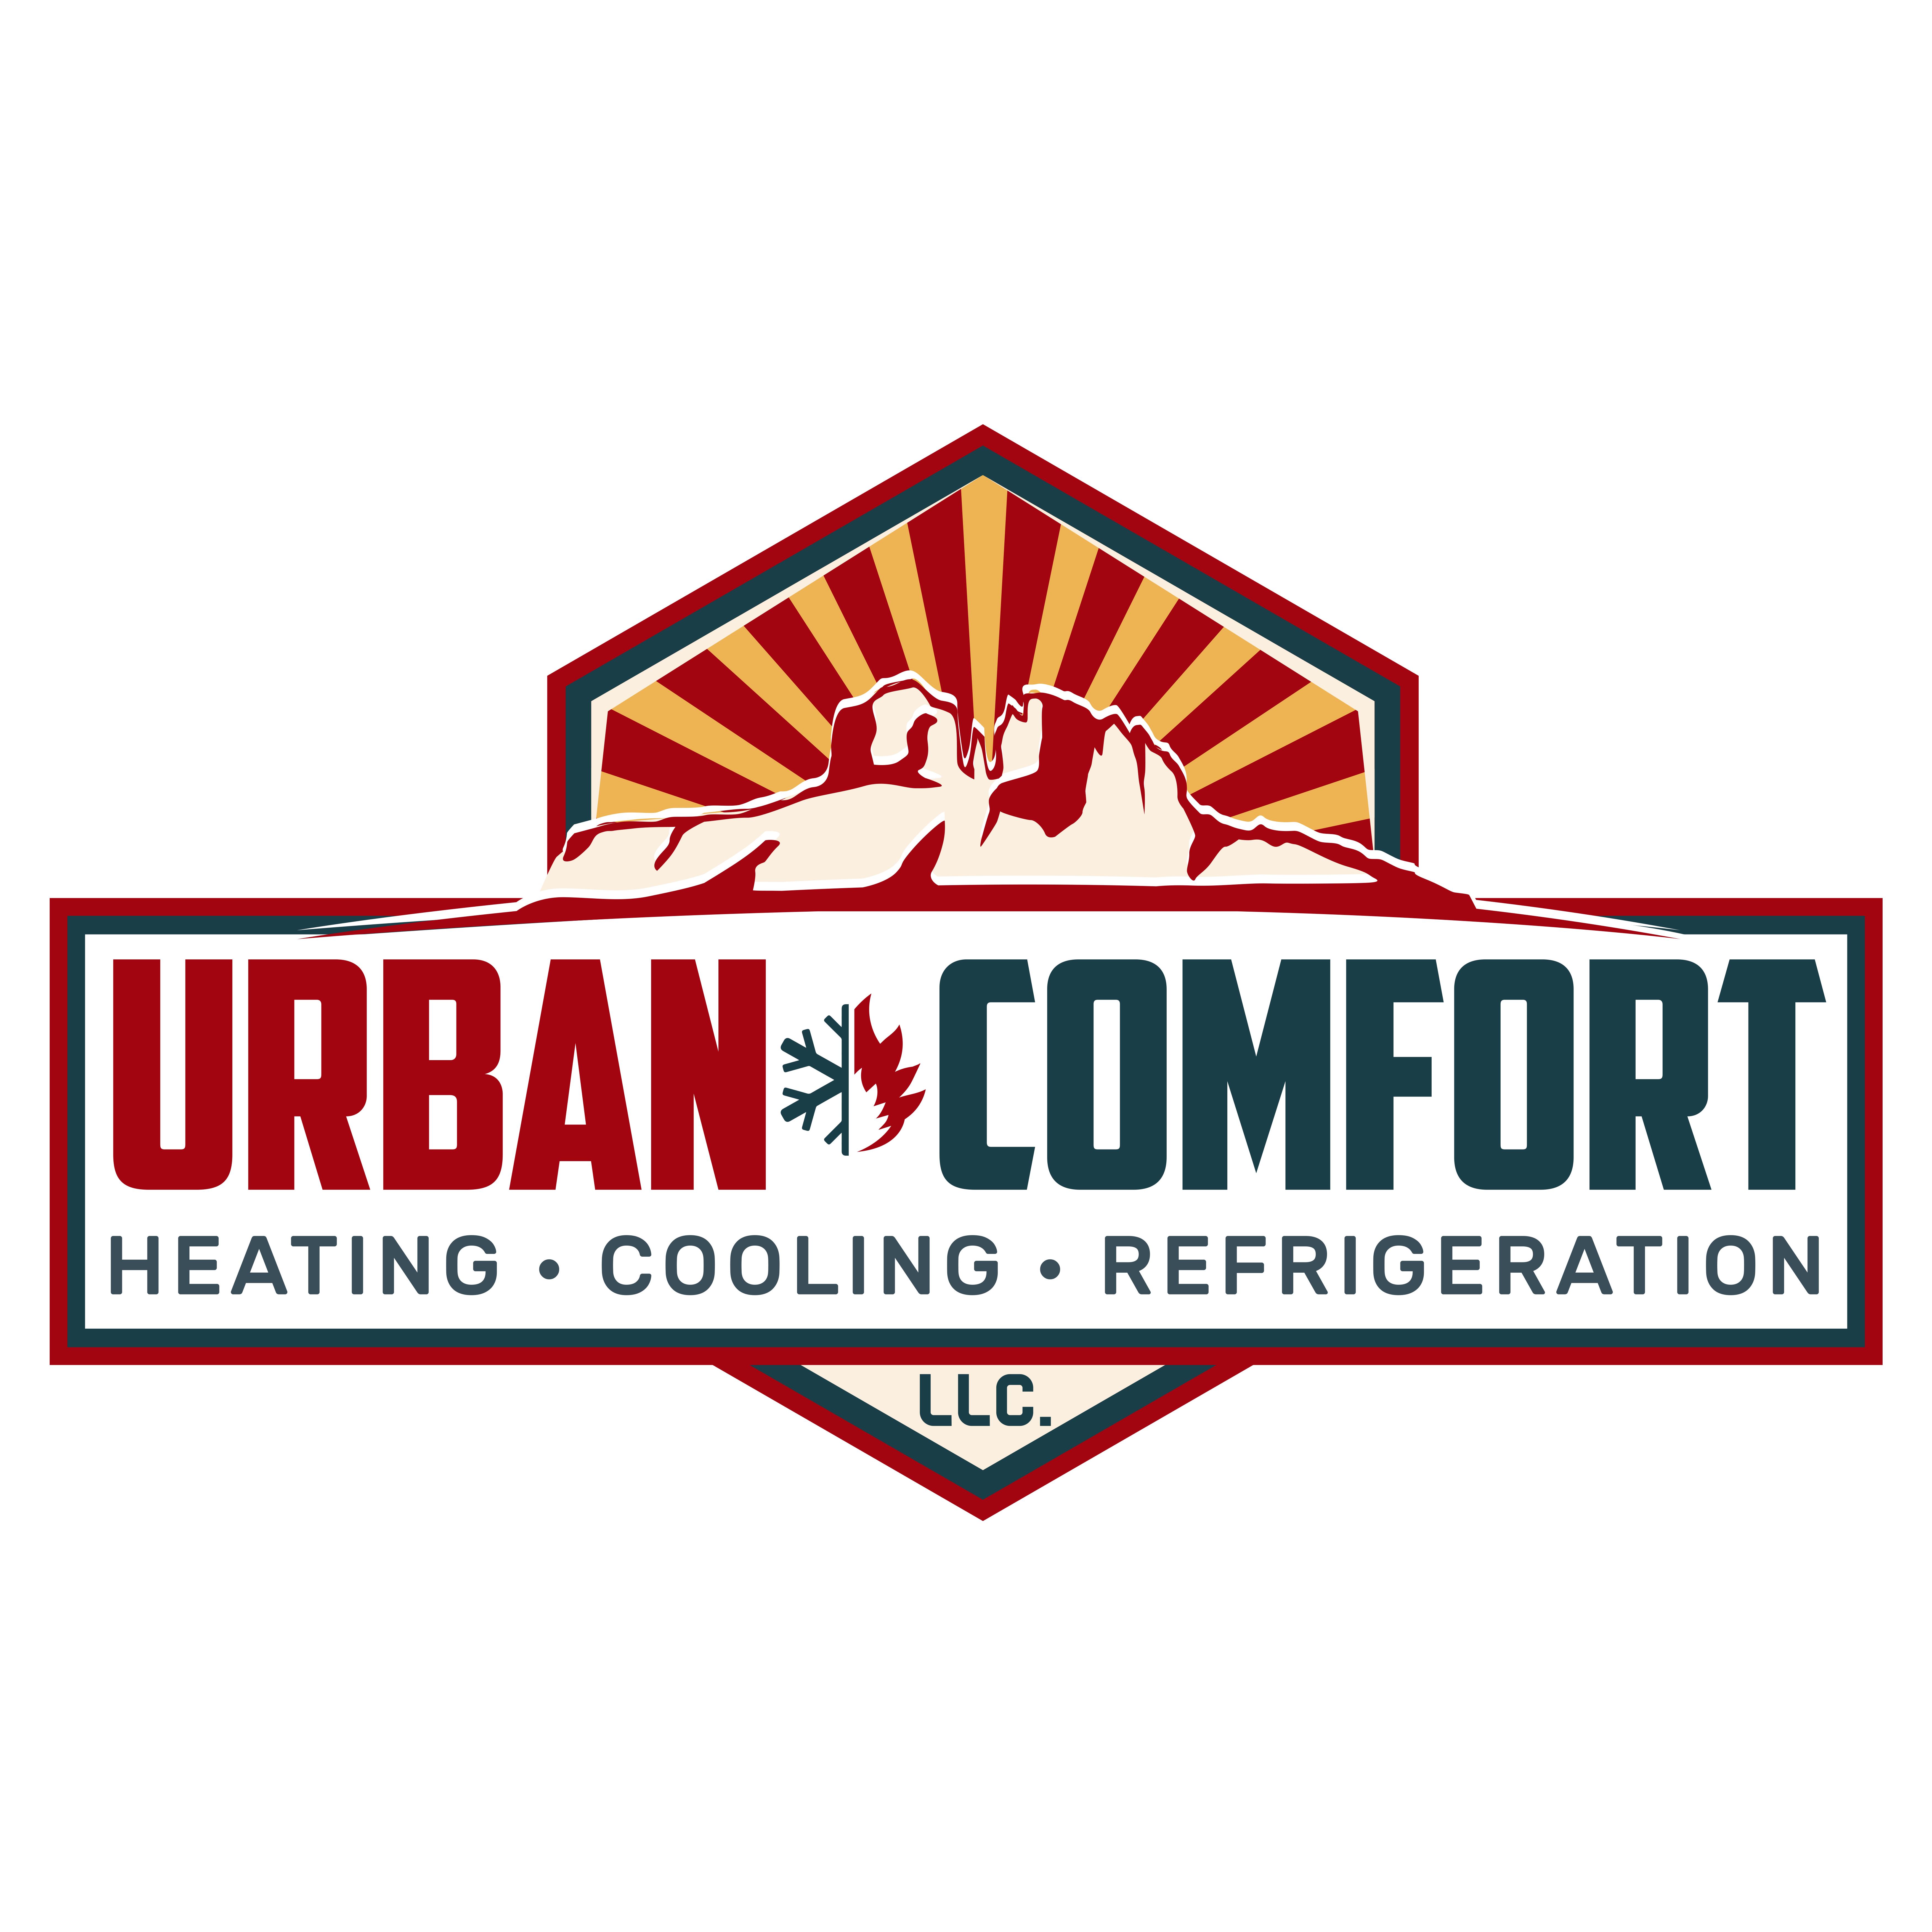 Urban Comfort LLC